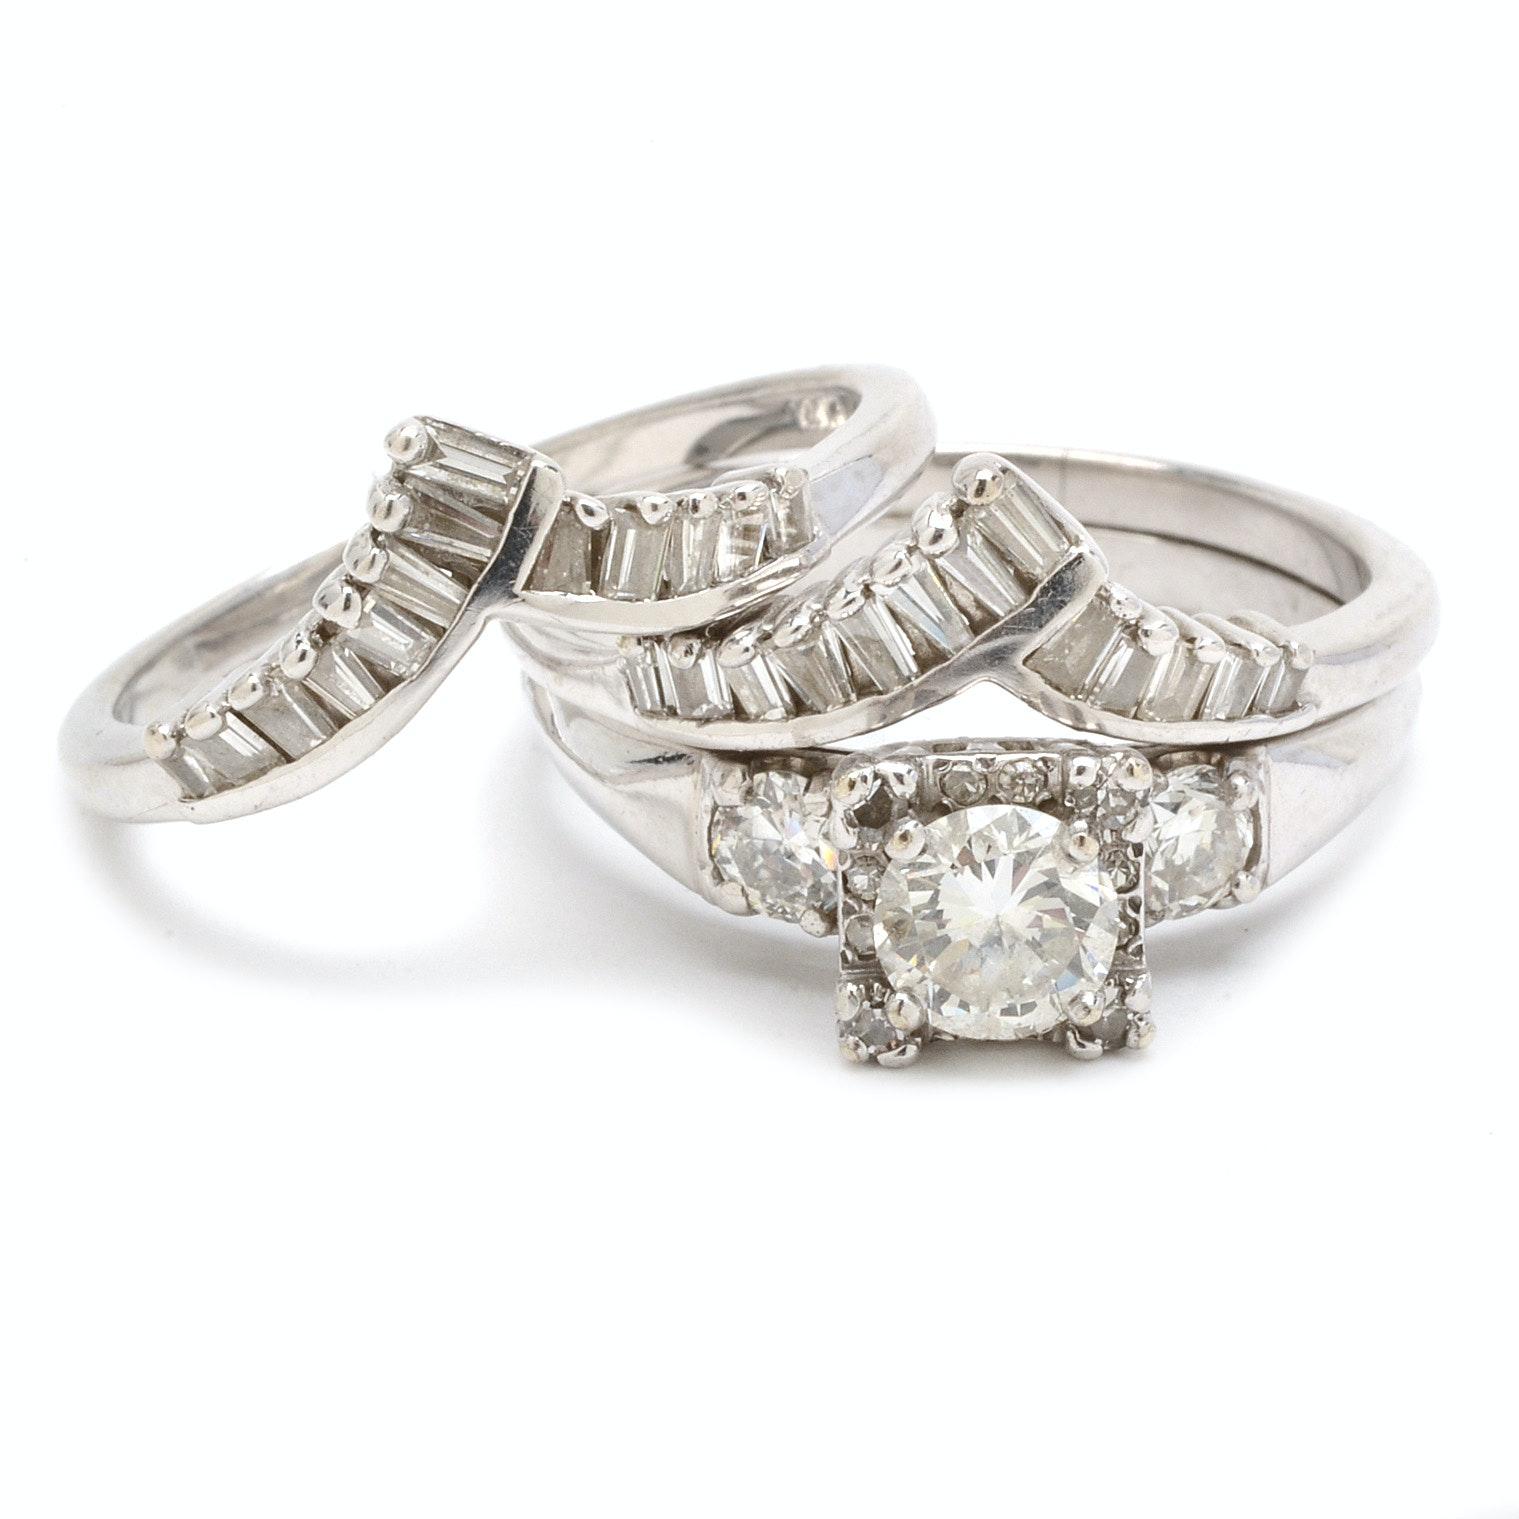 Platinum and 14K White Gold 2.28 CTW Diamond Wedding Ring Set